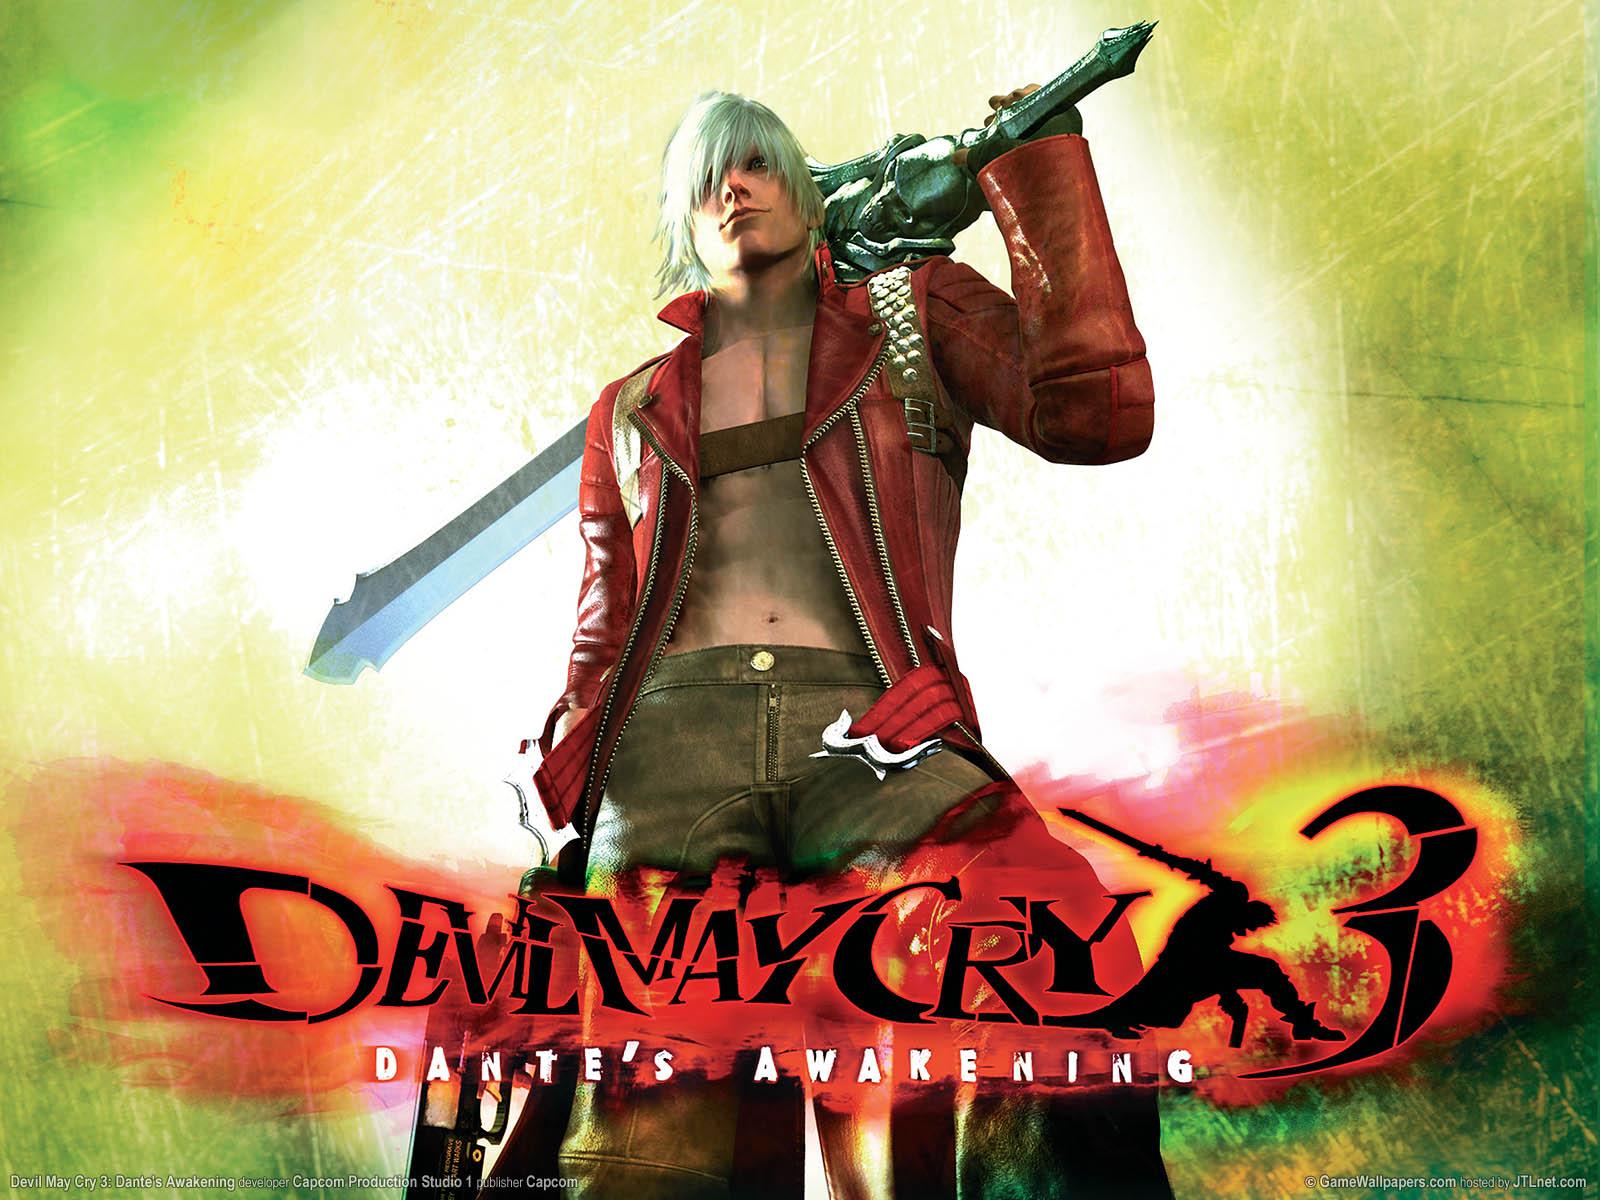 Devil May Cry 3 Dantes Awakening Wallpaper 01 1600x1200